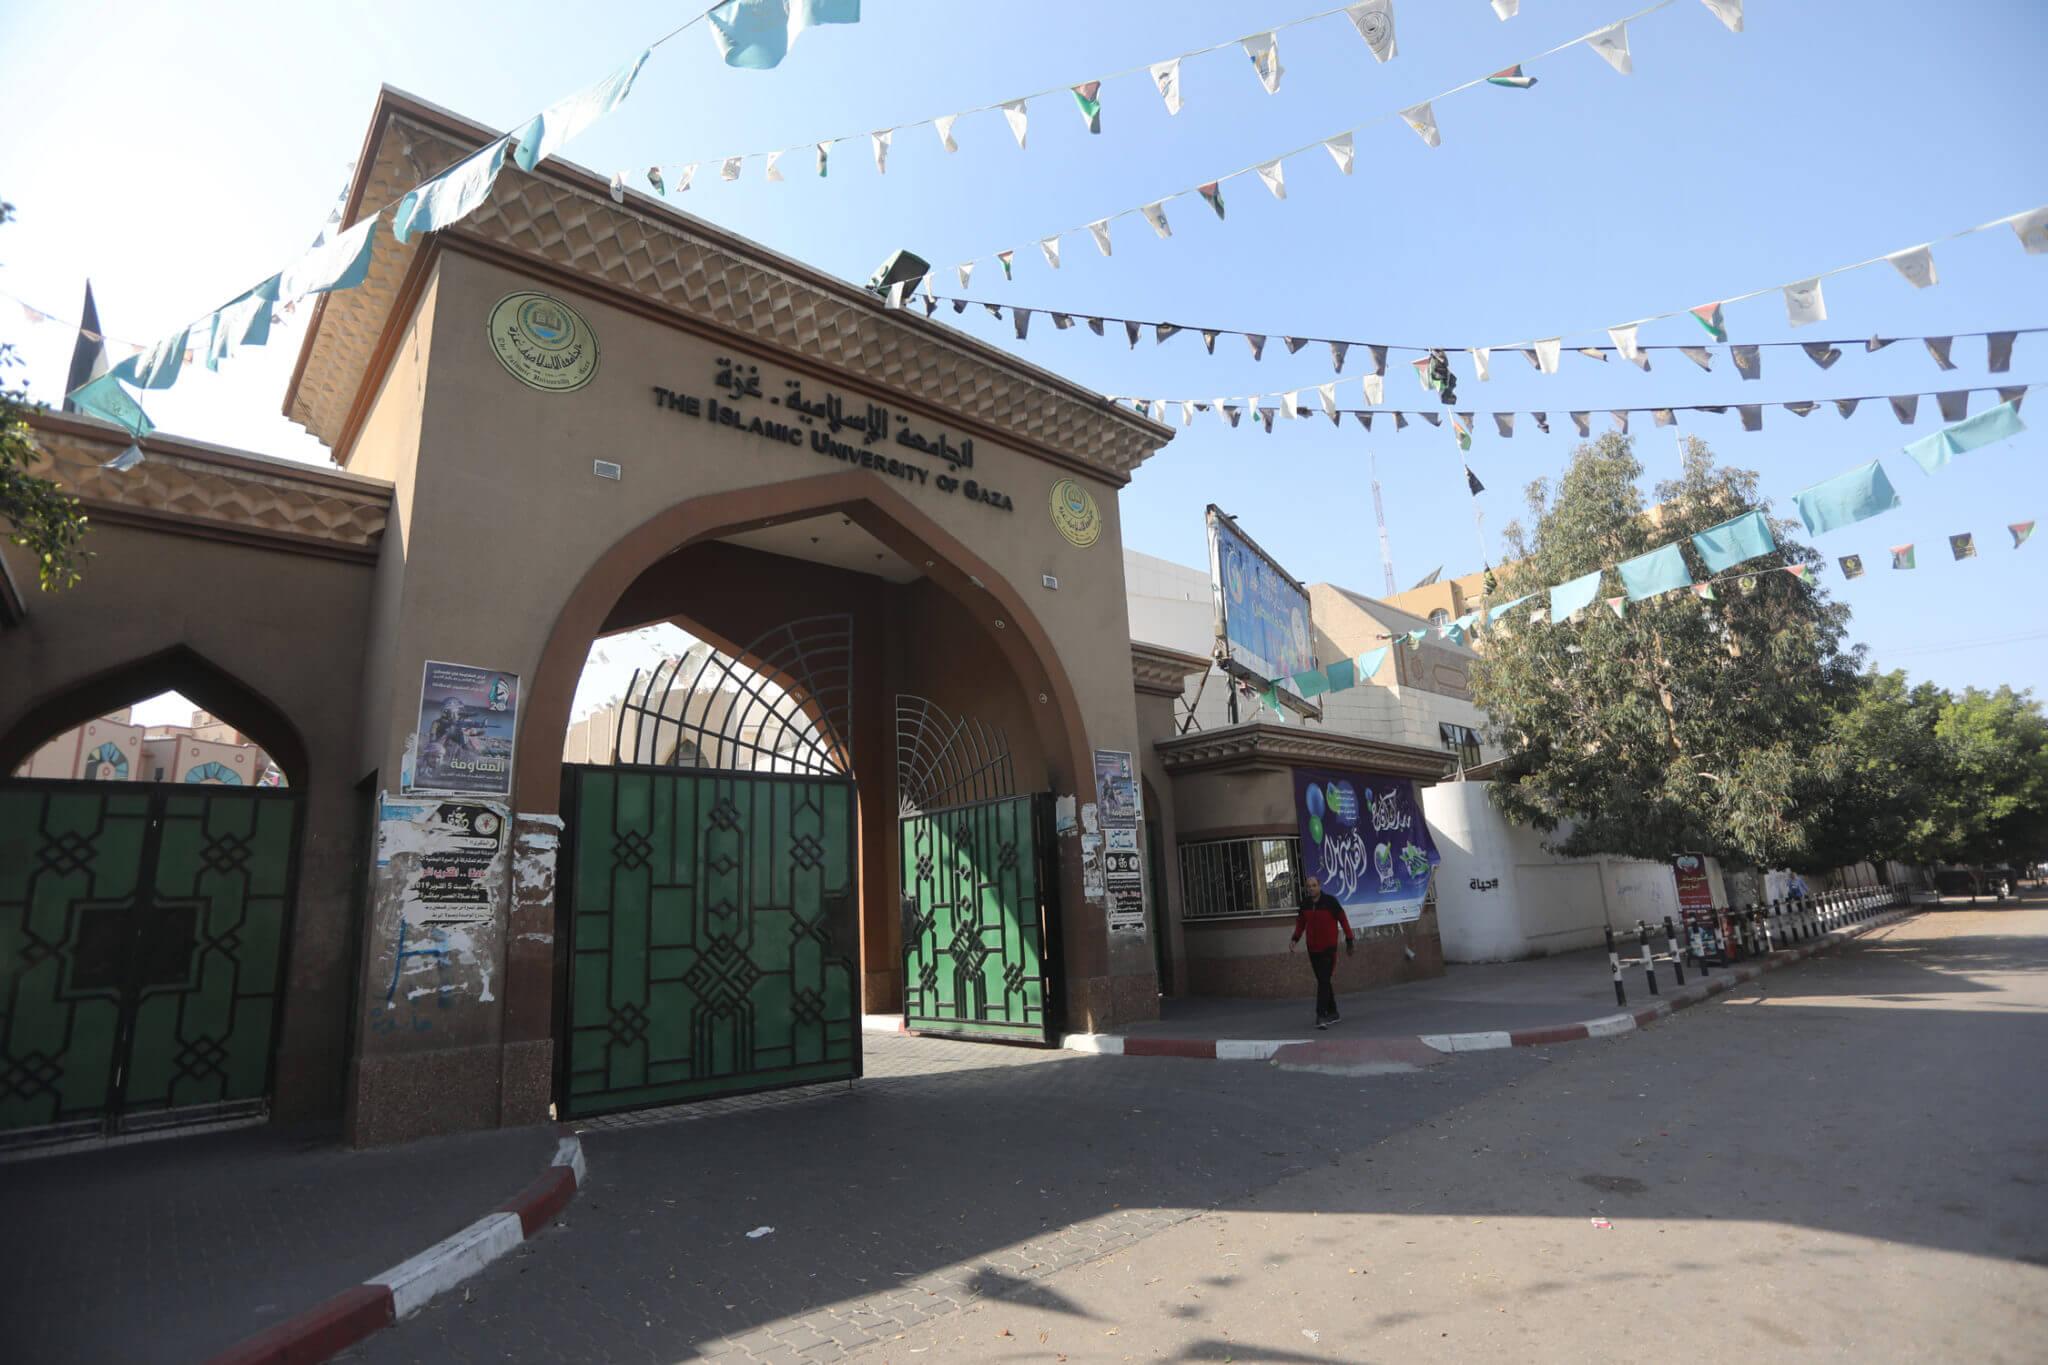 Palestinian universities are shut down.